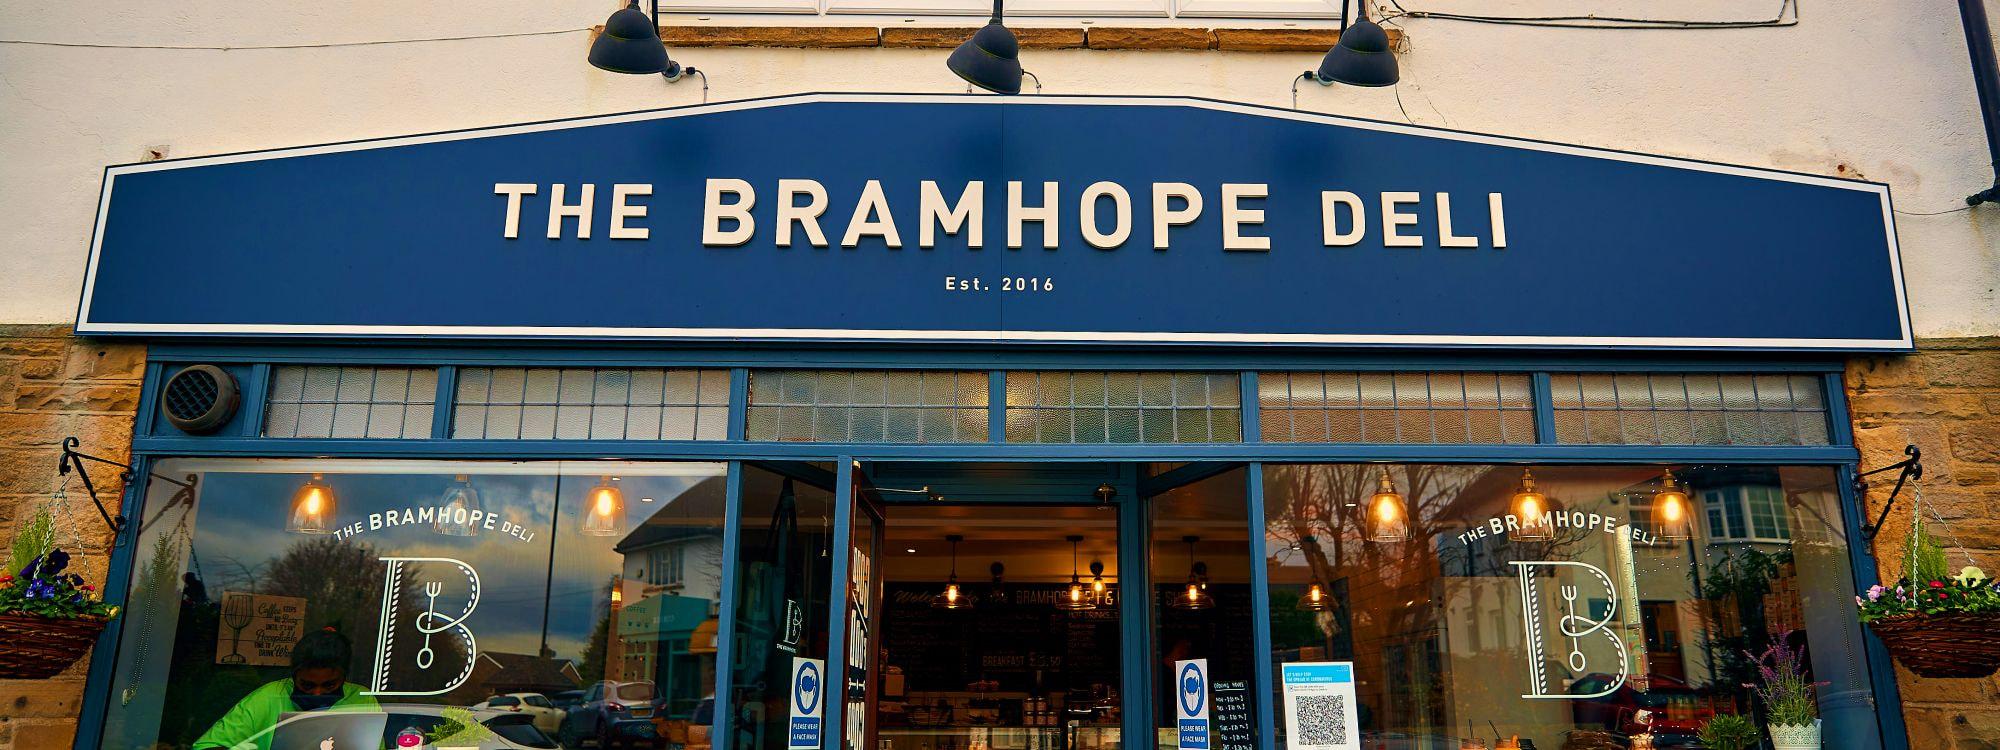 Outside of Bramhope Deli